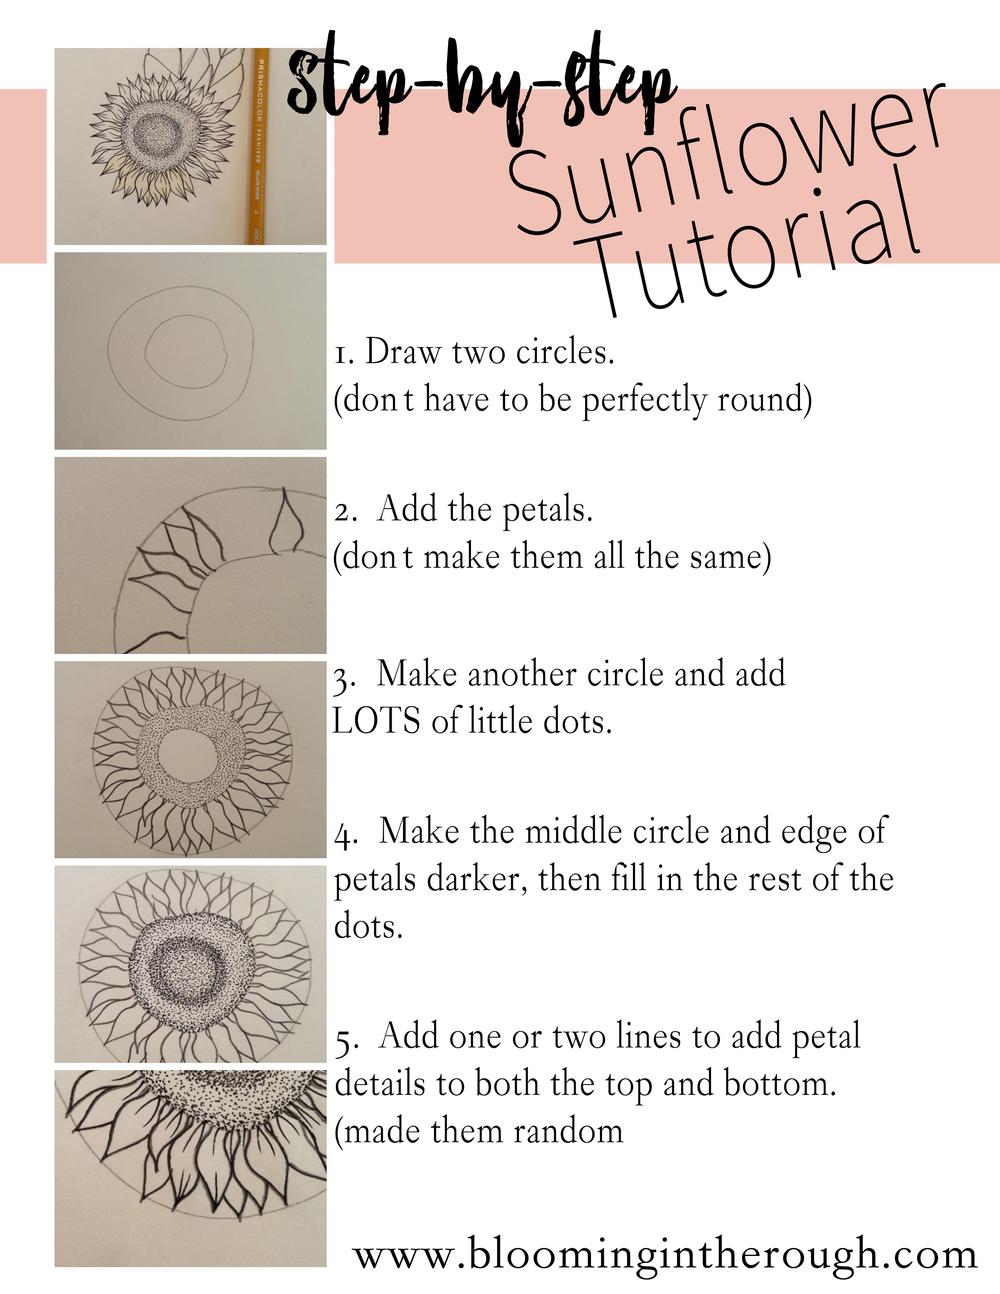 Sunflower Tutorial